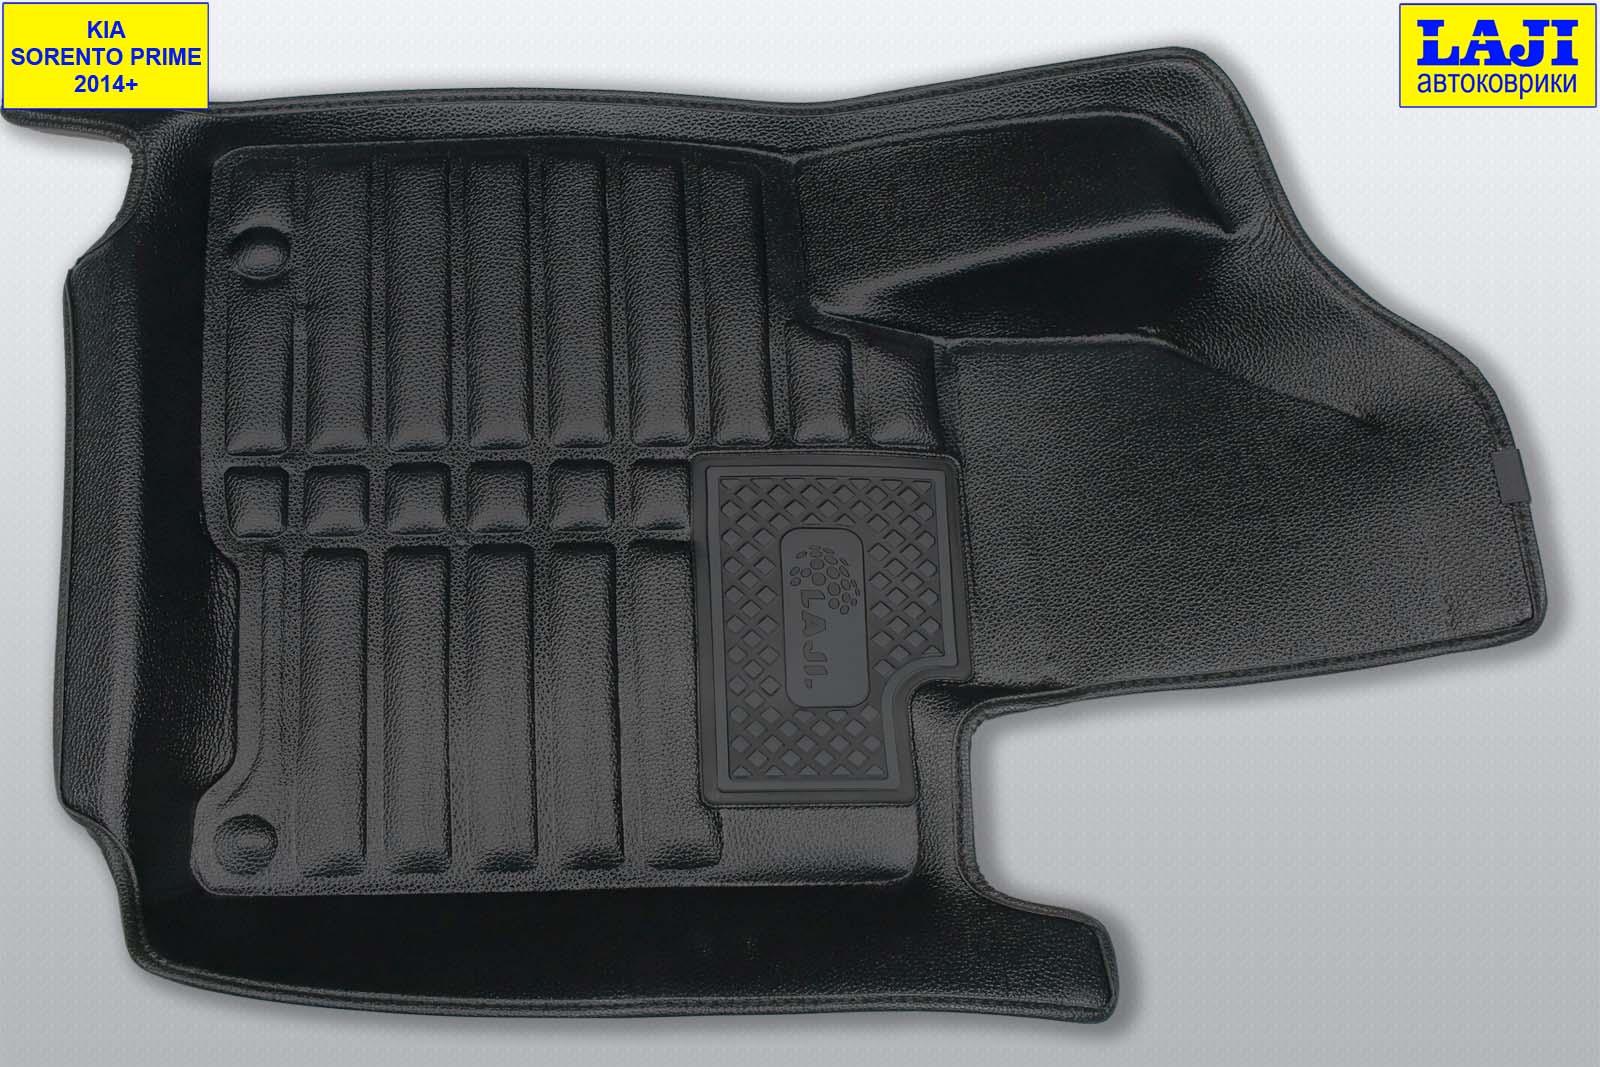 5D коврики в салон KIA Sorento Prime UM 2014-2020 3